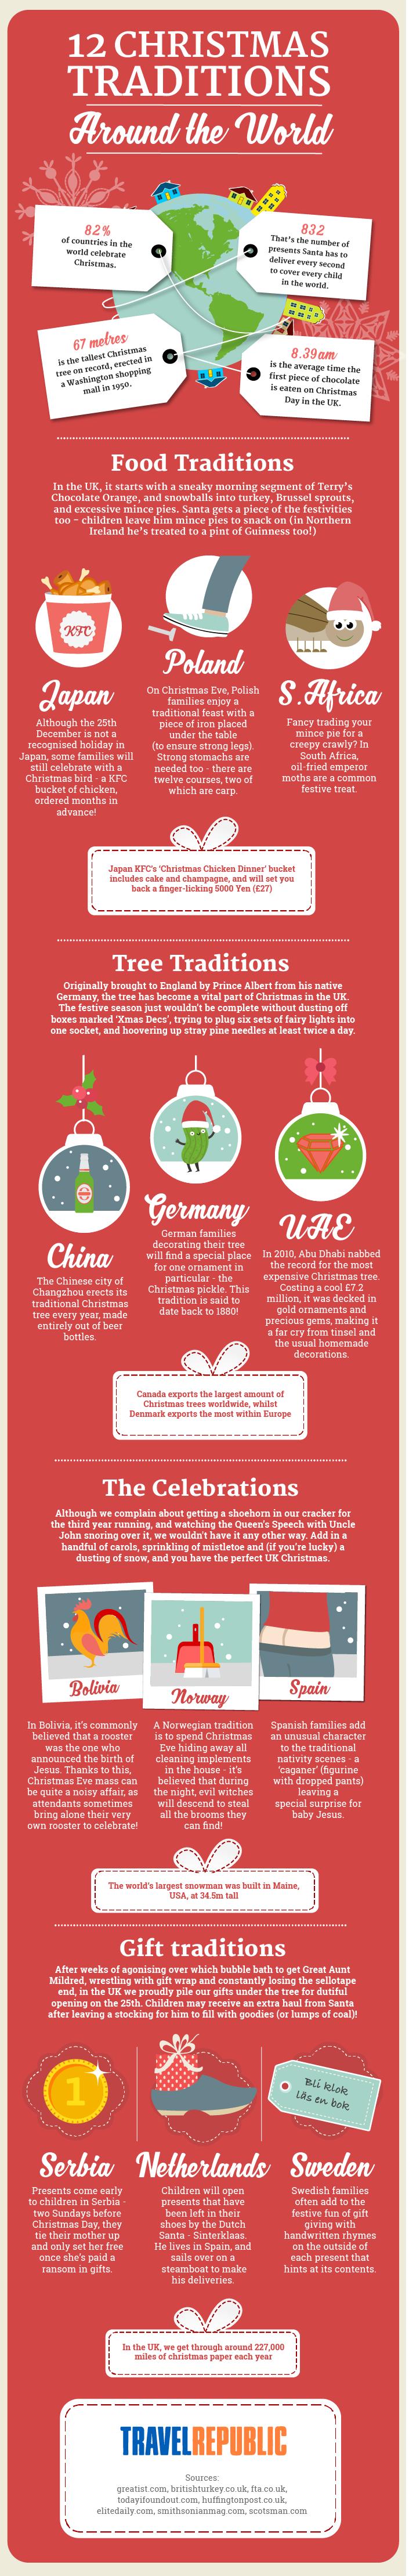 12 Christmas Traditions Around The World